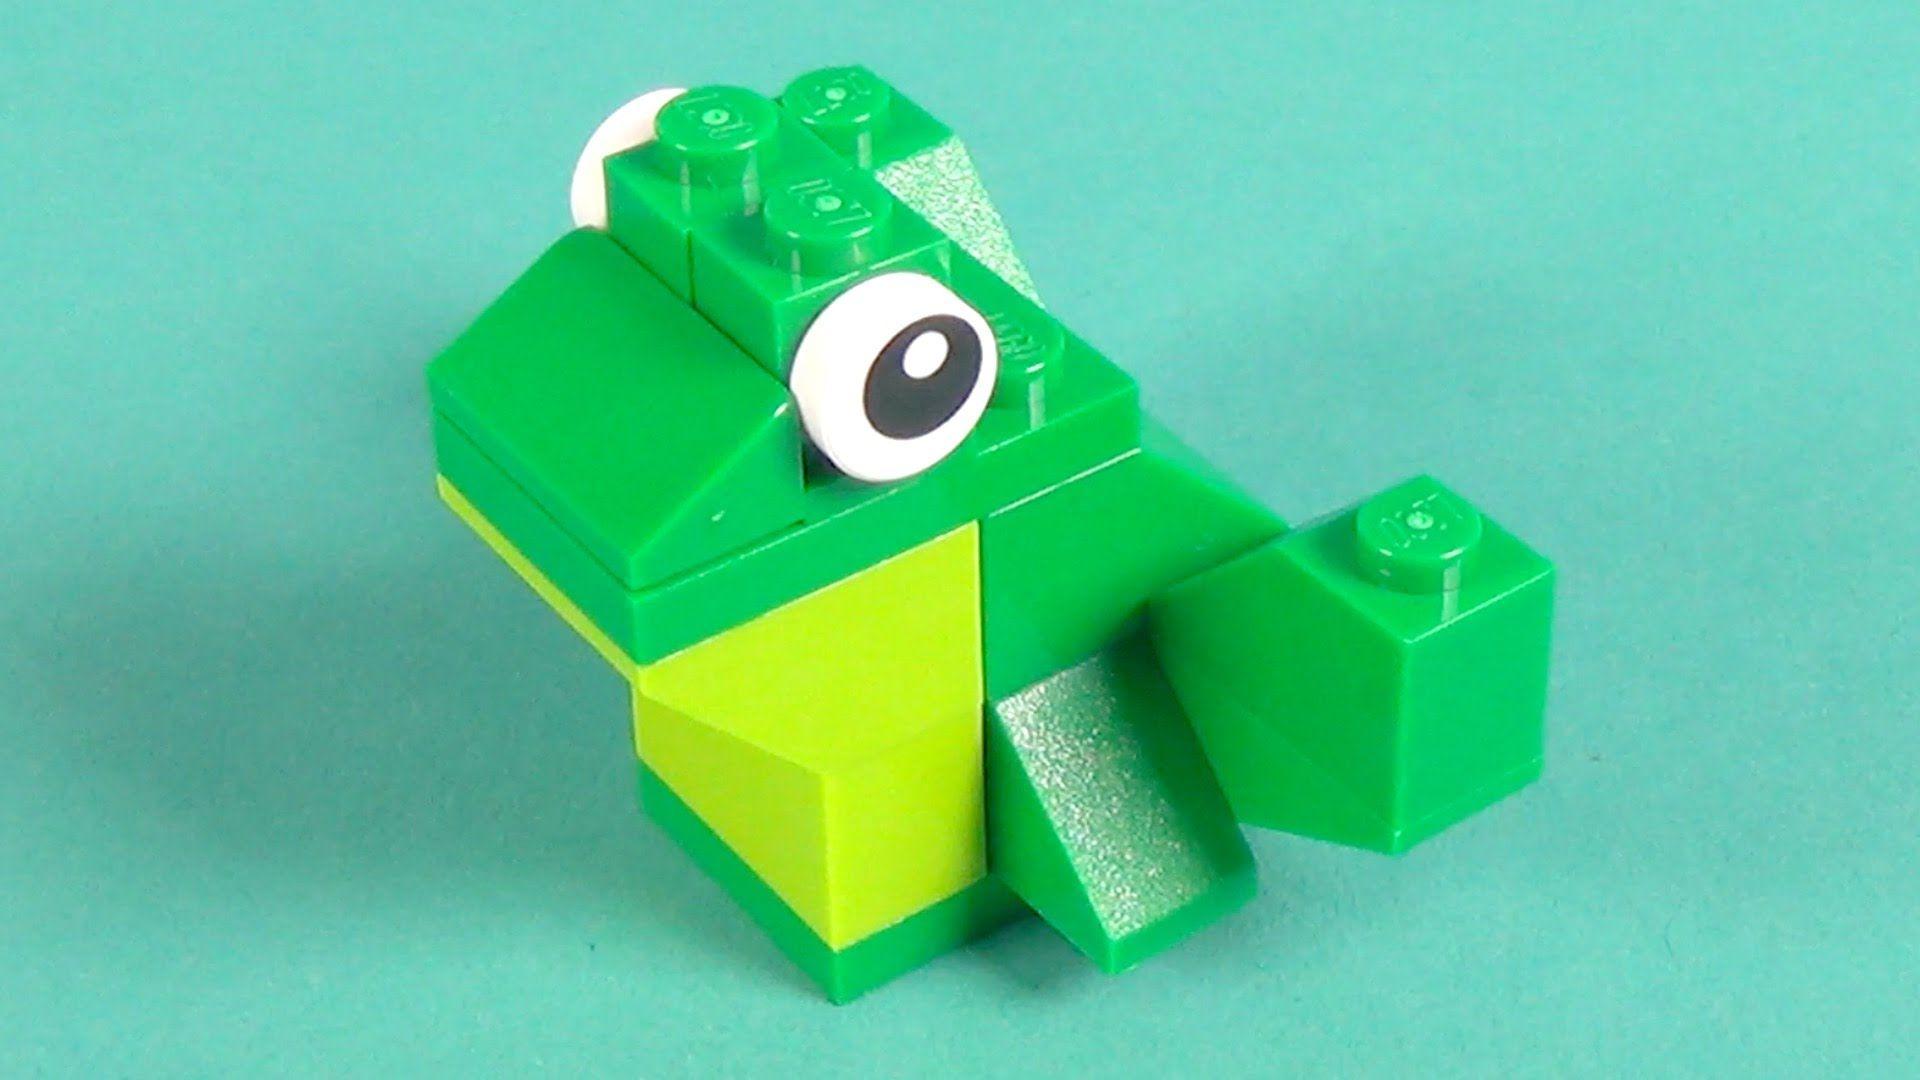 Lego Frog Building Instructions - Lego Classic 10698